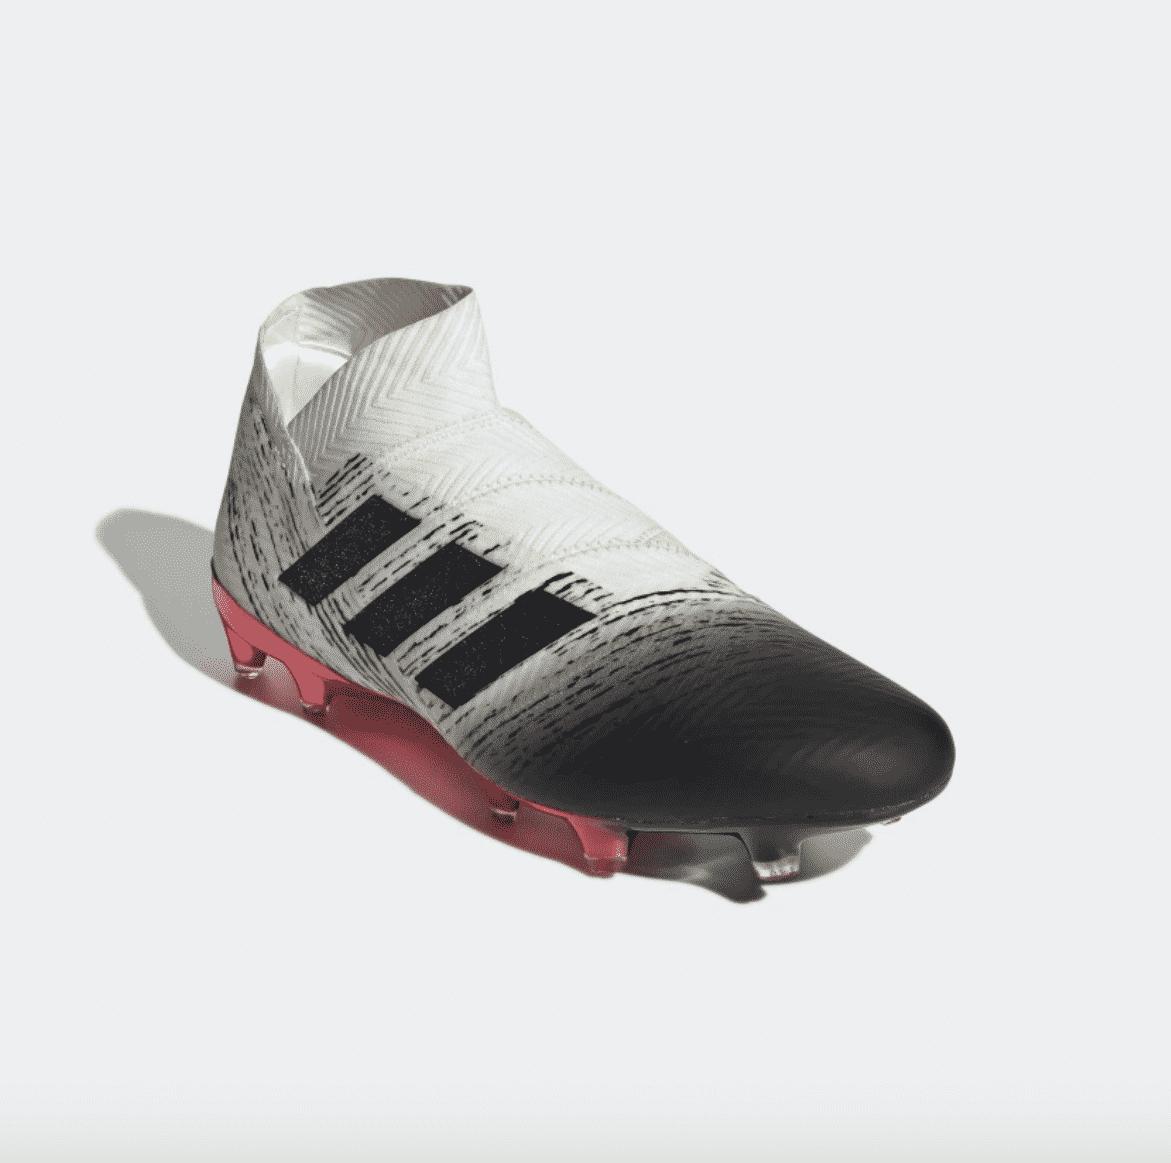 adidas-nemeziz-18+-initiator-pack-2